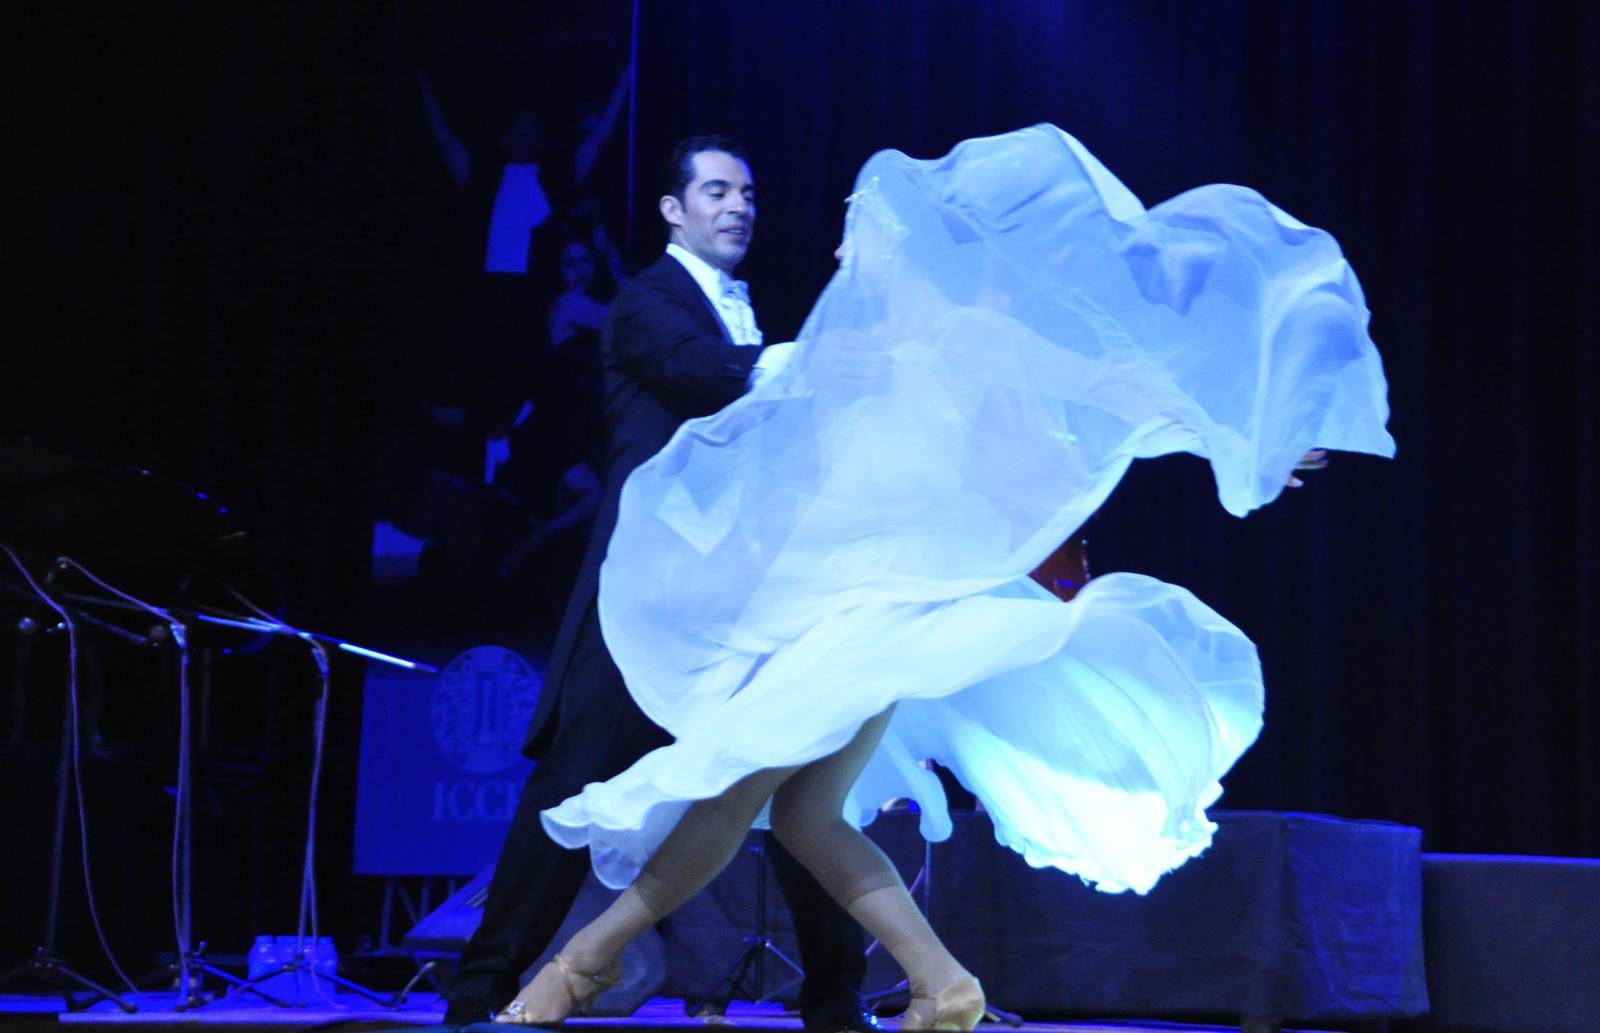 Fiesta Latino Americano - Argentina's Tango, sirifort, New Delhi